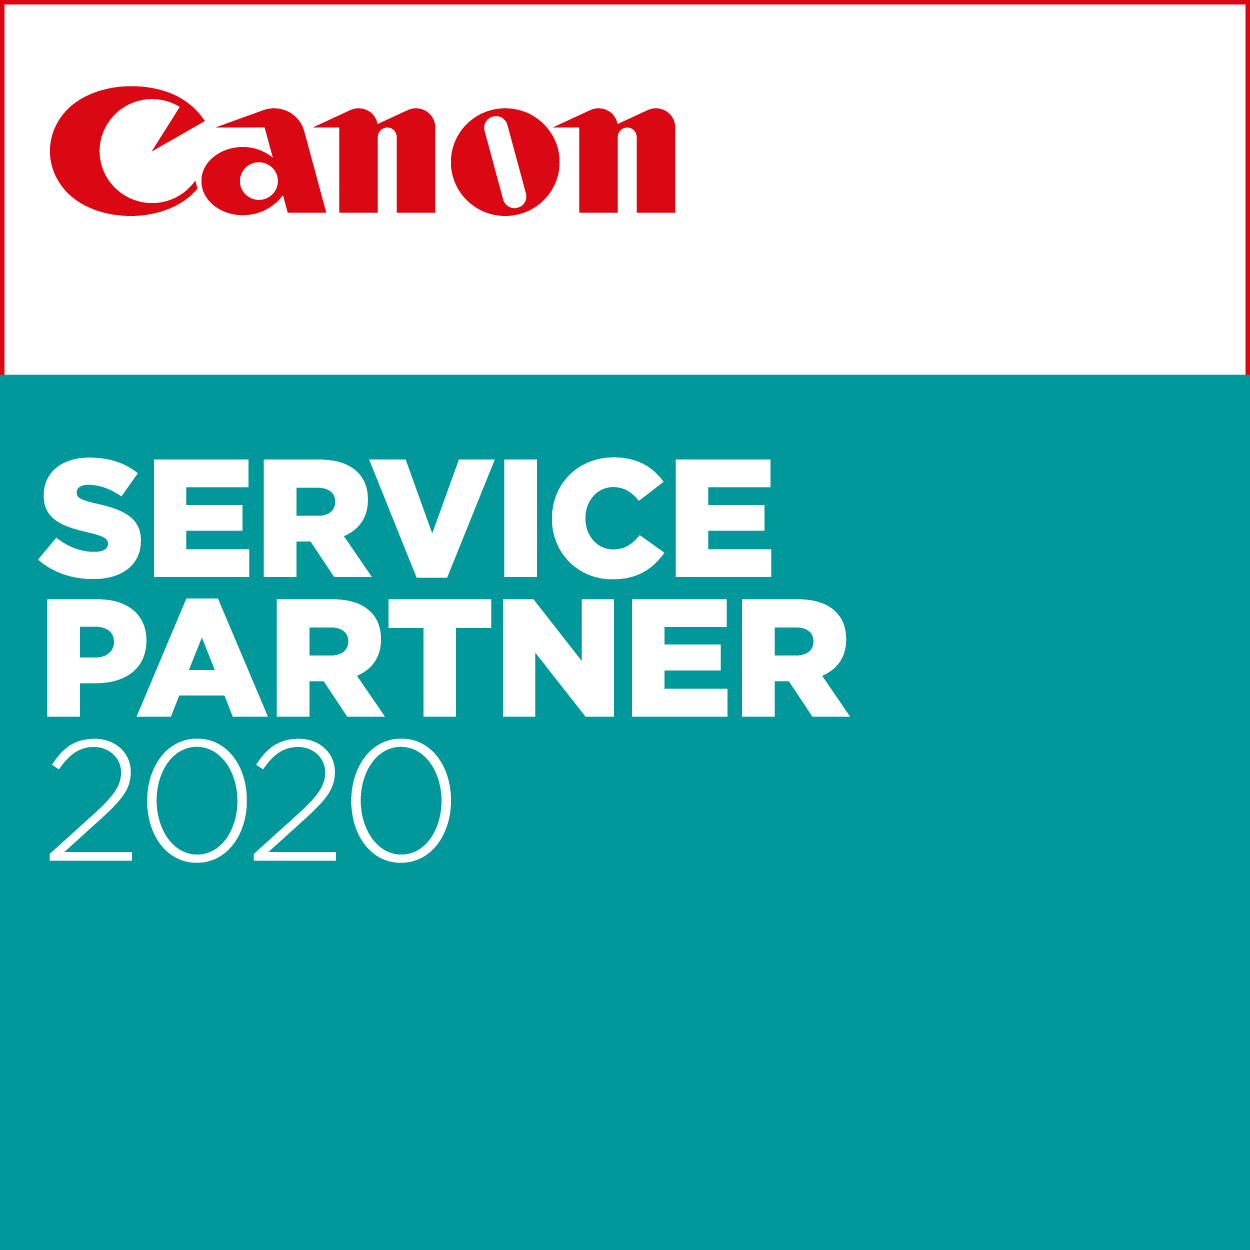 Logo Canon Service Partner Digital Use Only RGB 2020 Logo Canon Service Partner Digital Use Only RGB 2020 copy